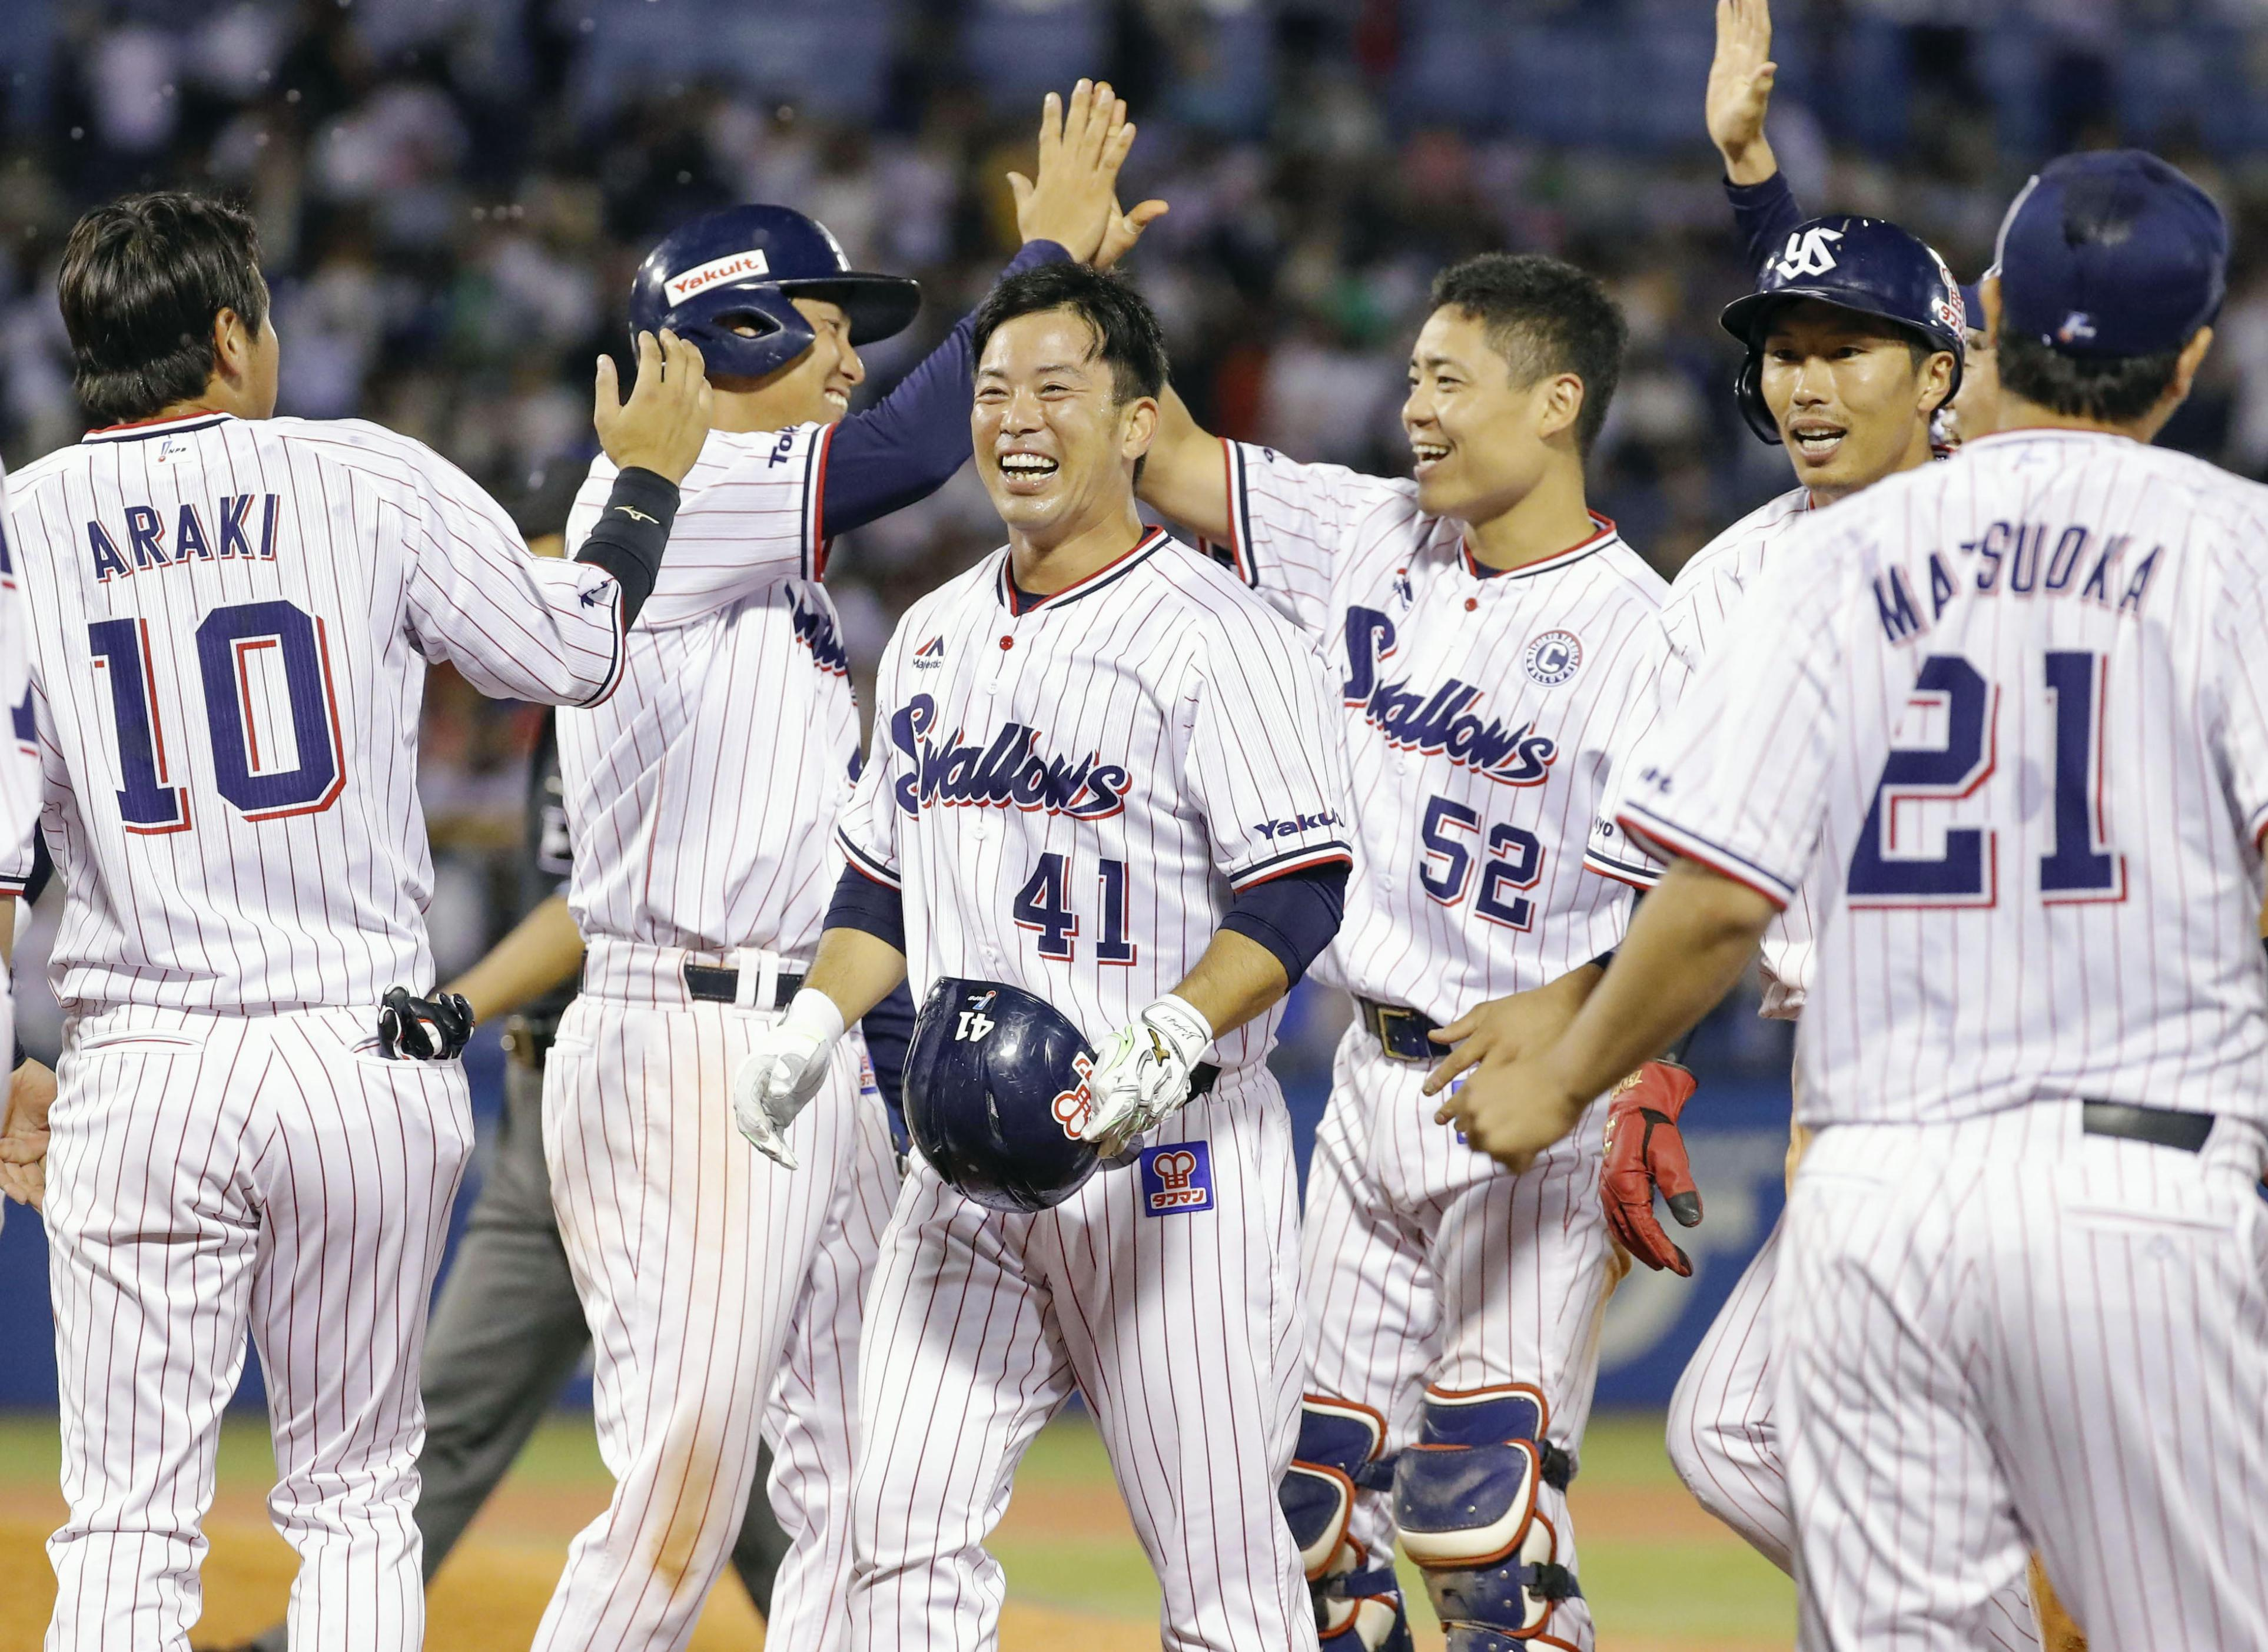 BASEBALL GATE              プロ野球            14年以来の1試合2発!東京ヤクルト・雄平がチームを7連勝に導く!